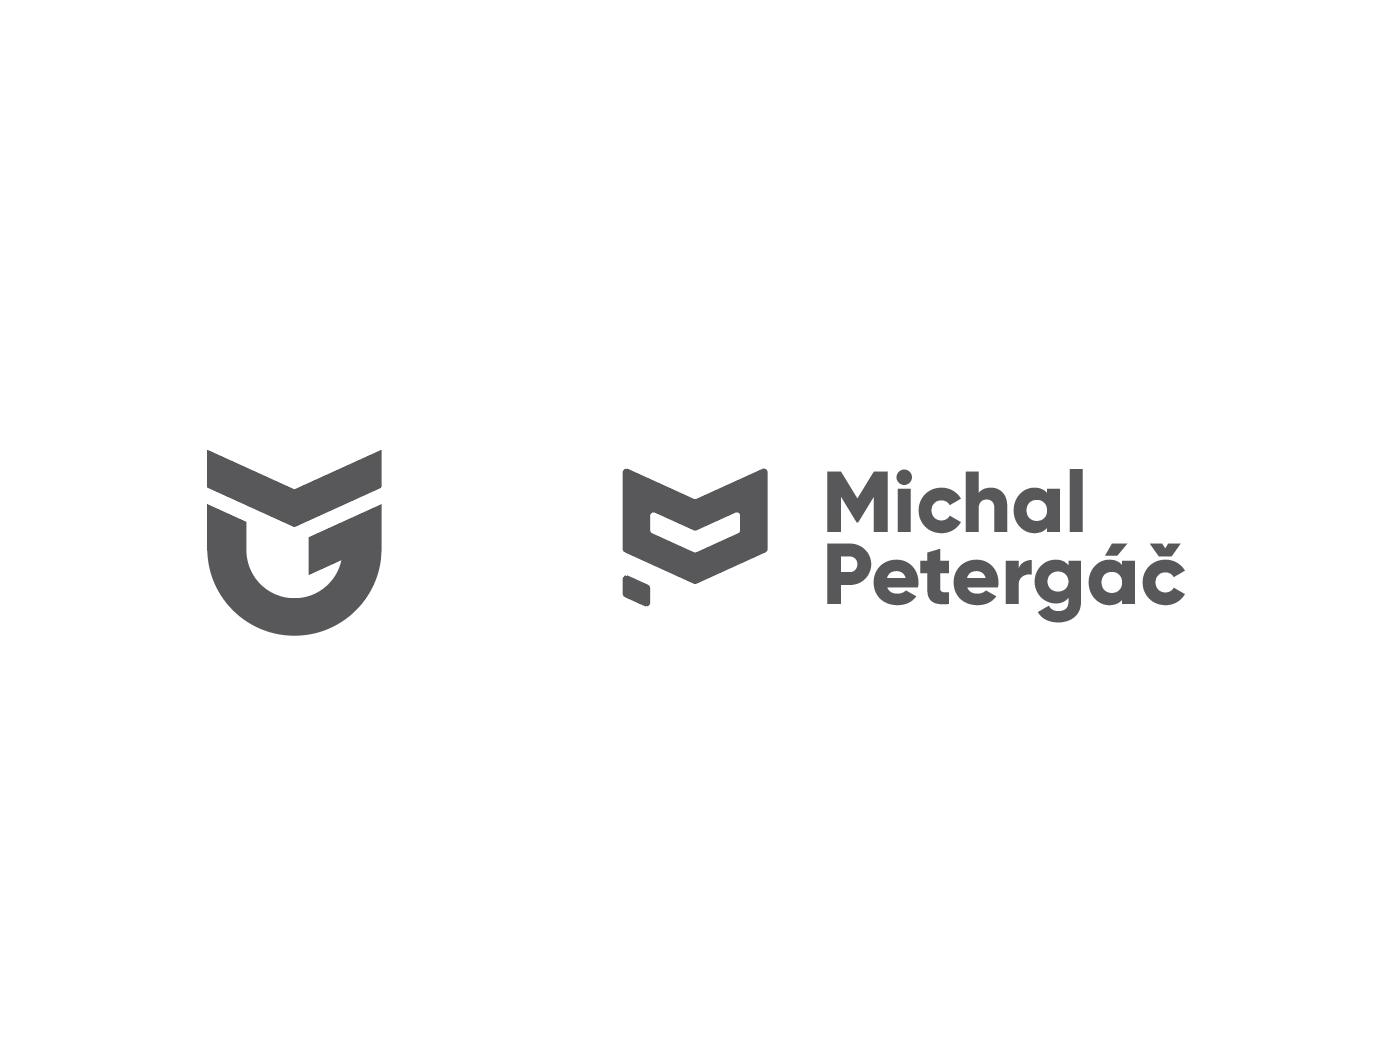 Yaaay! Time for personal rebrand! logo making graphic design logos logo logo creation personal project personal brand pm logo mp logo personal logo rebranding